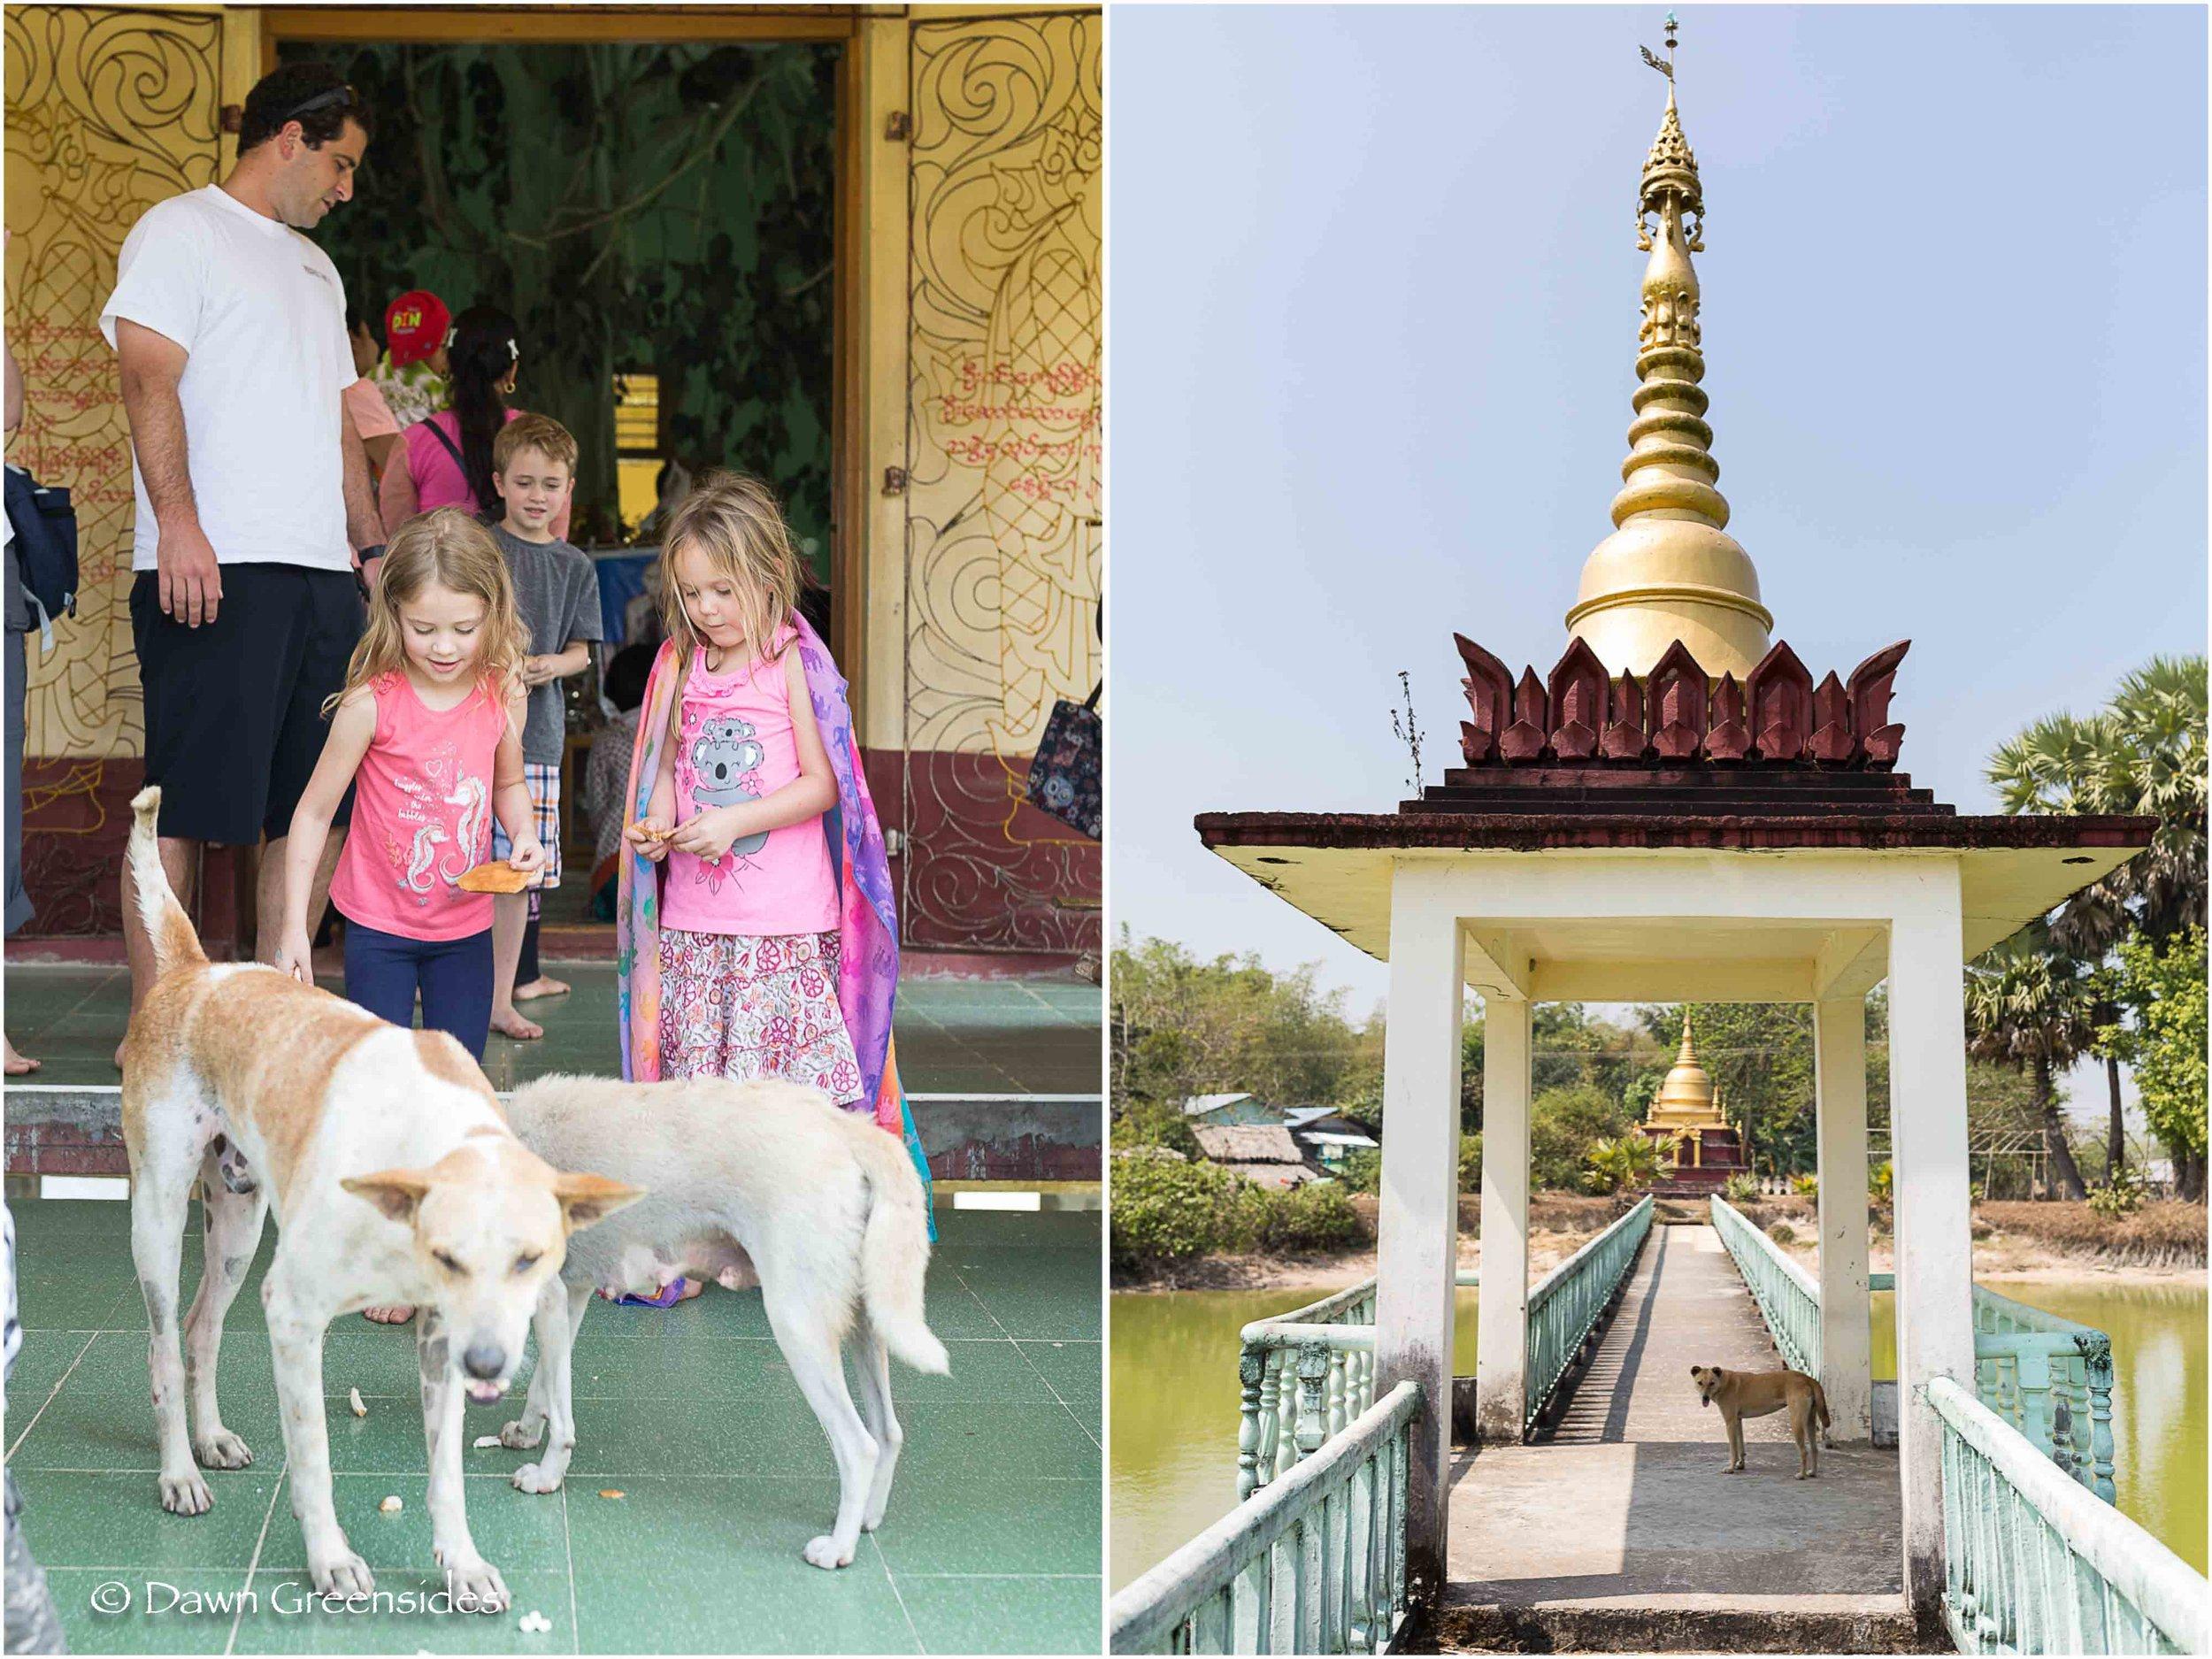 Pagoda-3.jpg